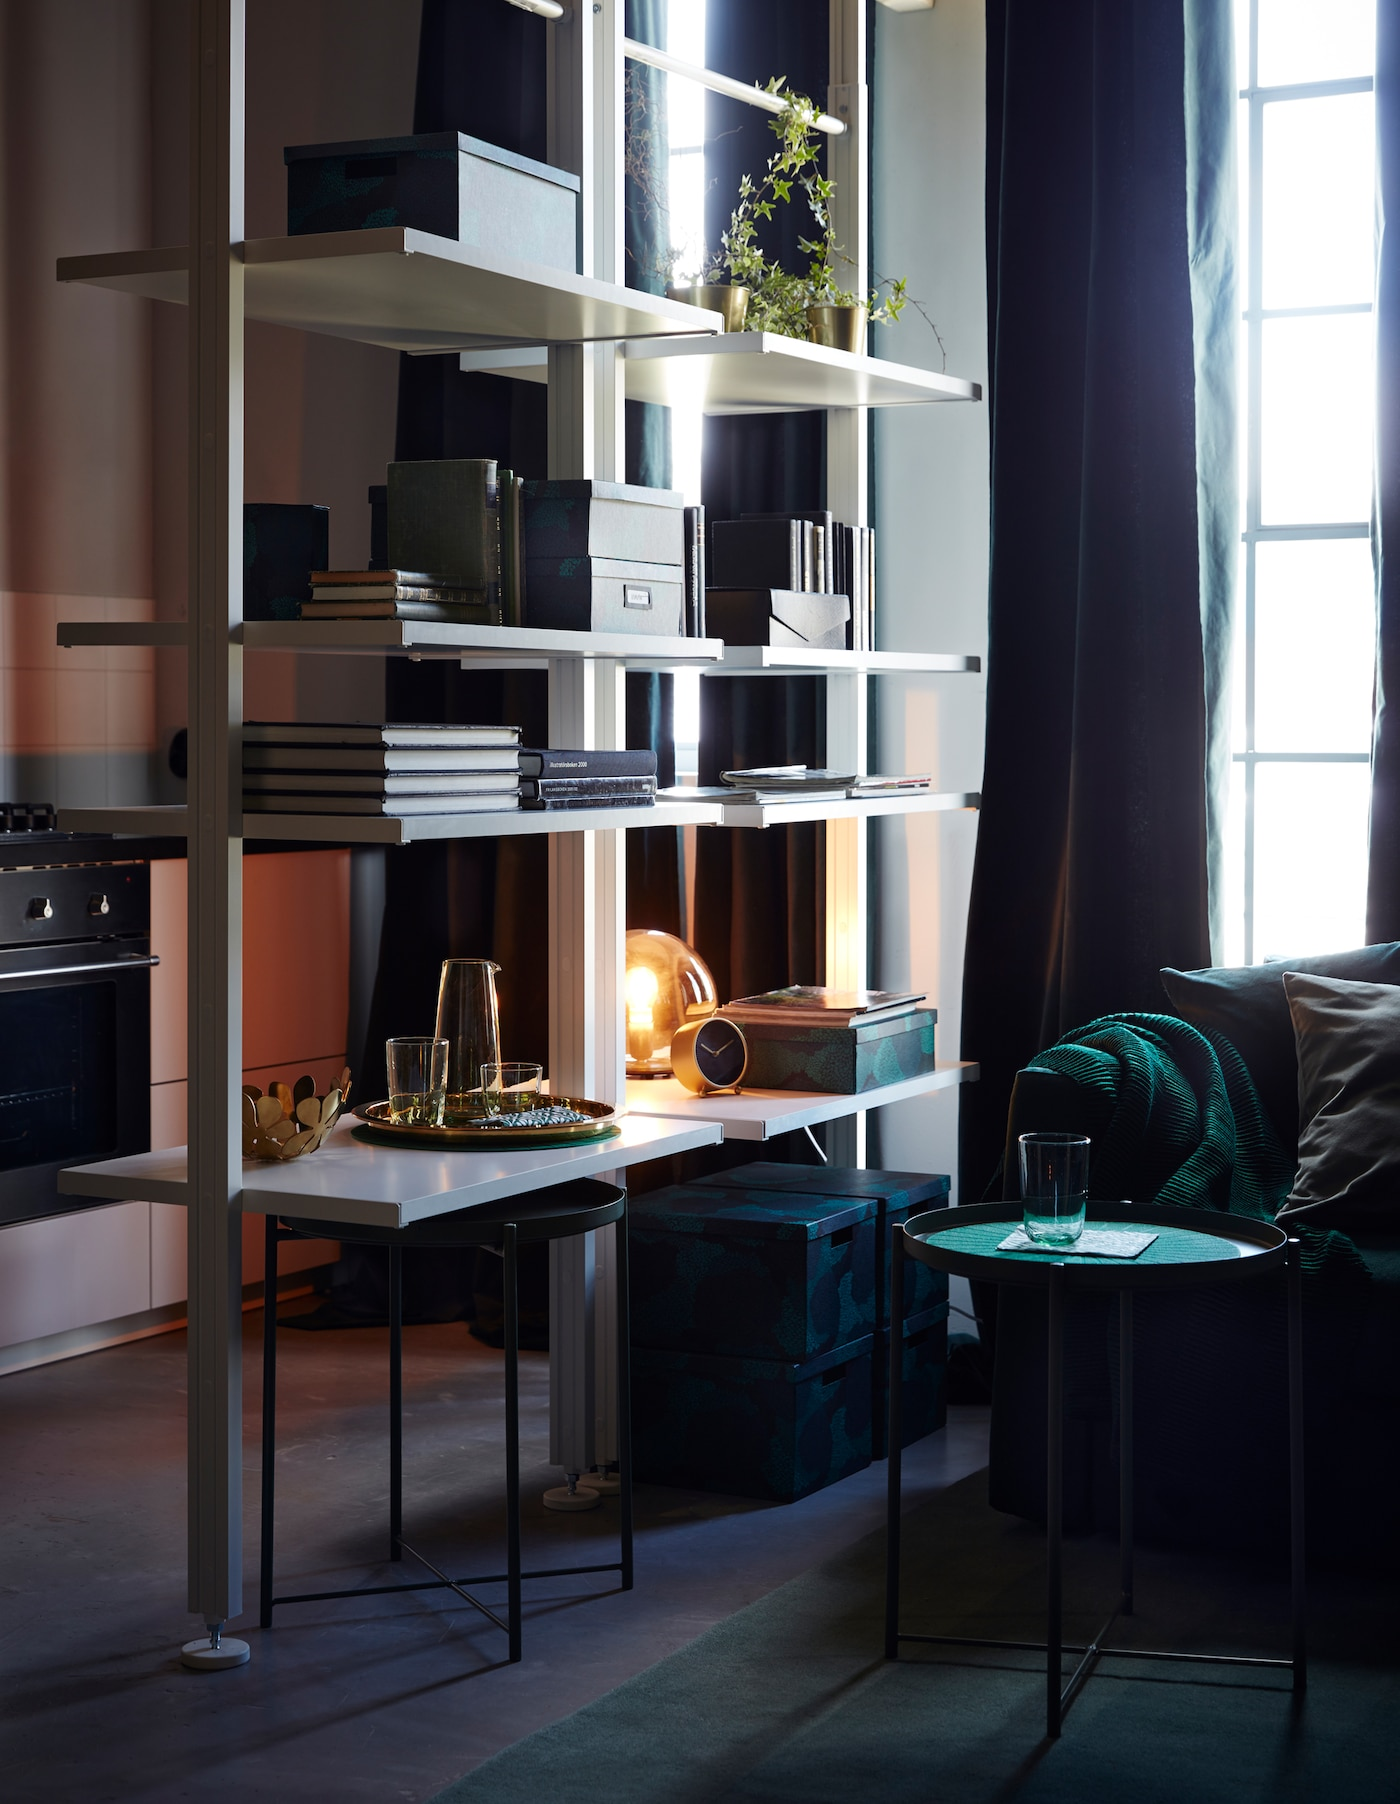 Neu Schrank Raumteiler   Raumteiler, Raumteiler ikea